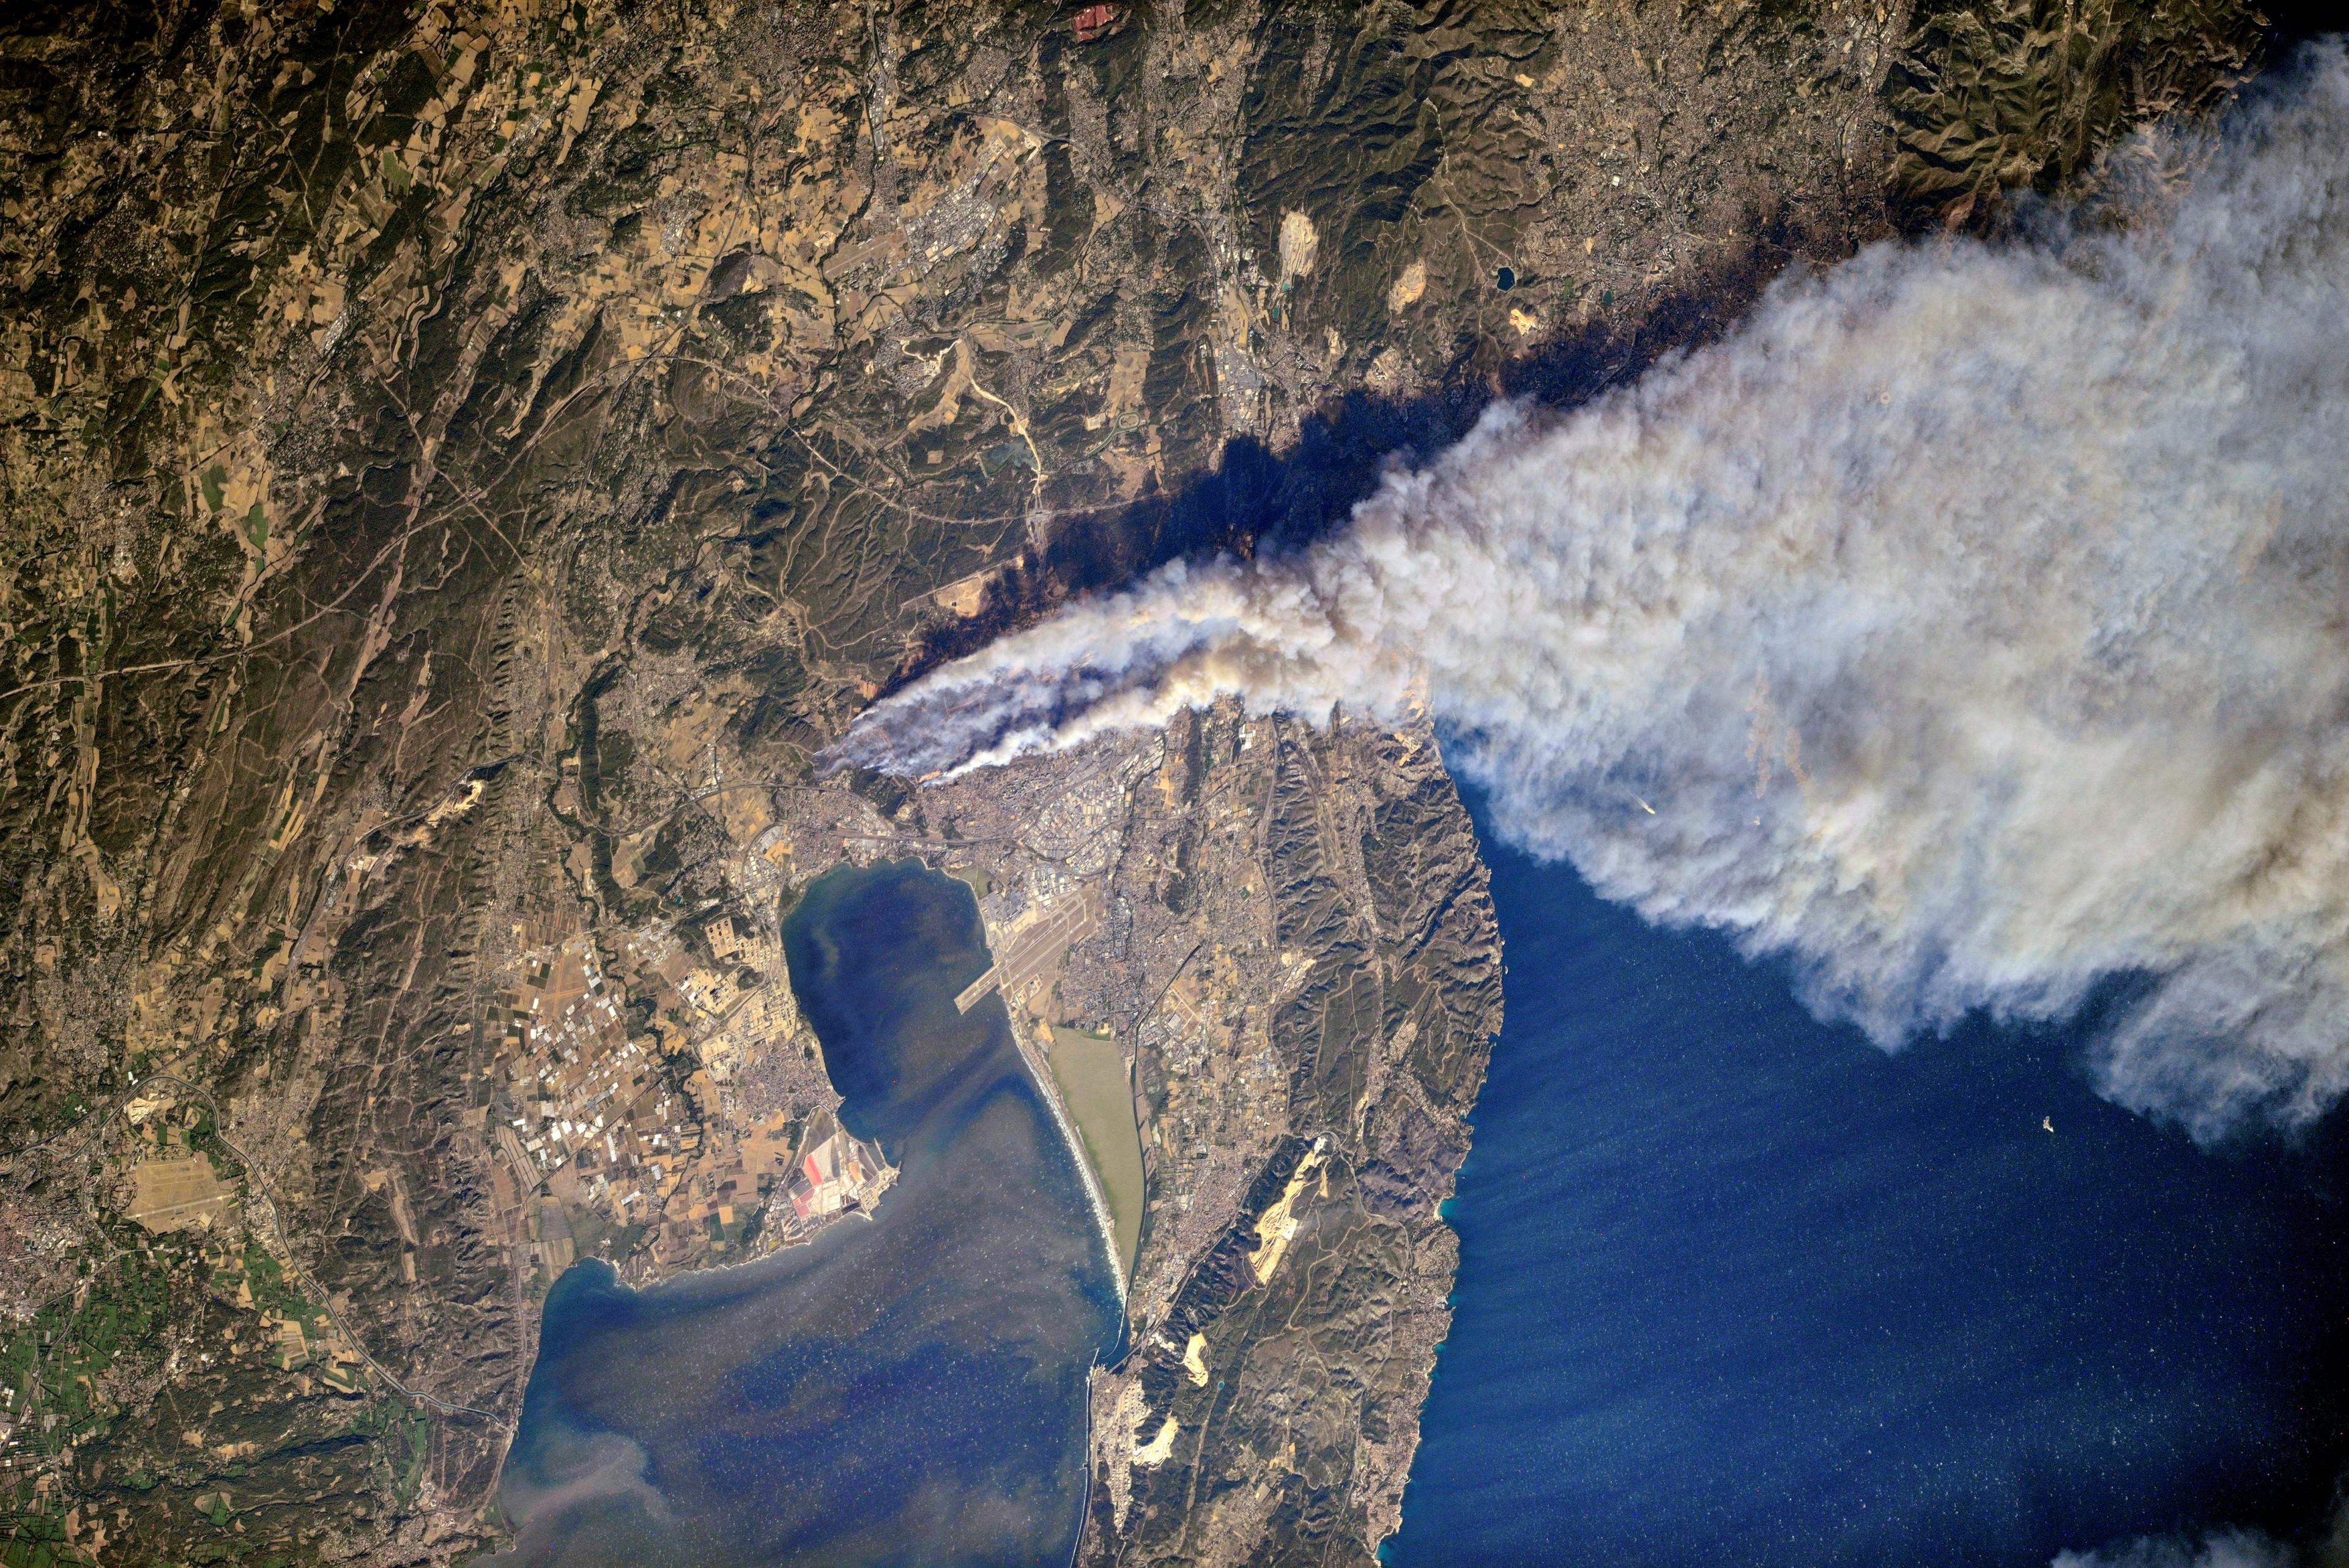 Incendies Marseille Vitrolles Etang de Berre - Les Pennes-Mirabeau - Août 2016 - Station Spatiale Internationale - ISS - Fire - Roscosmos - Oleg Skripochka